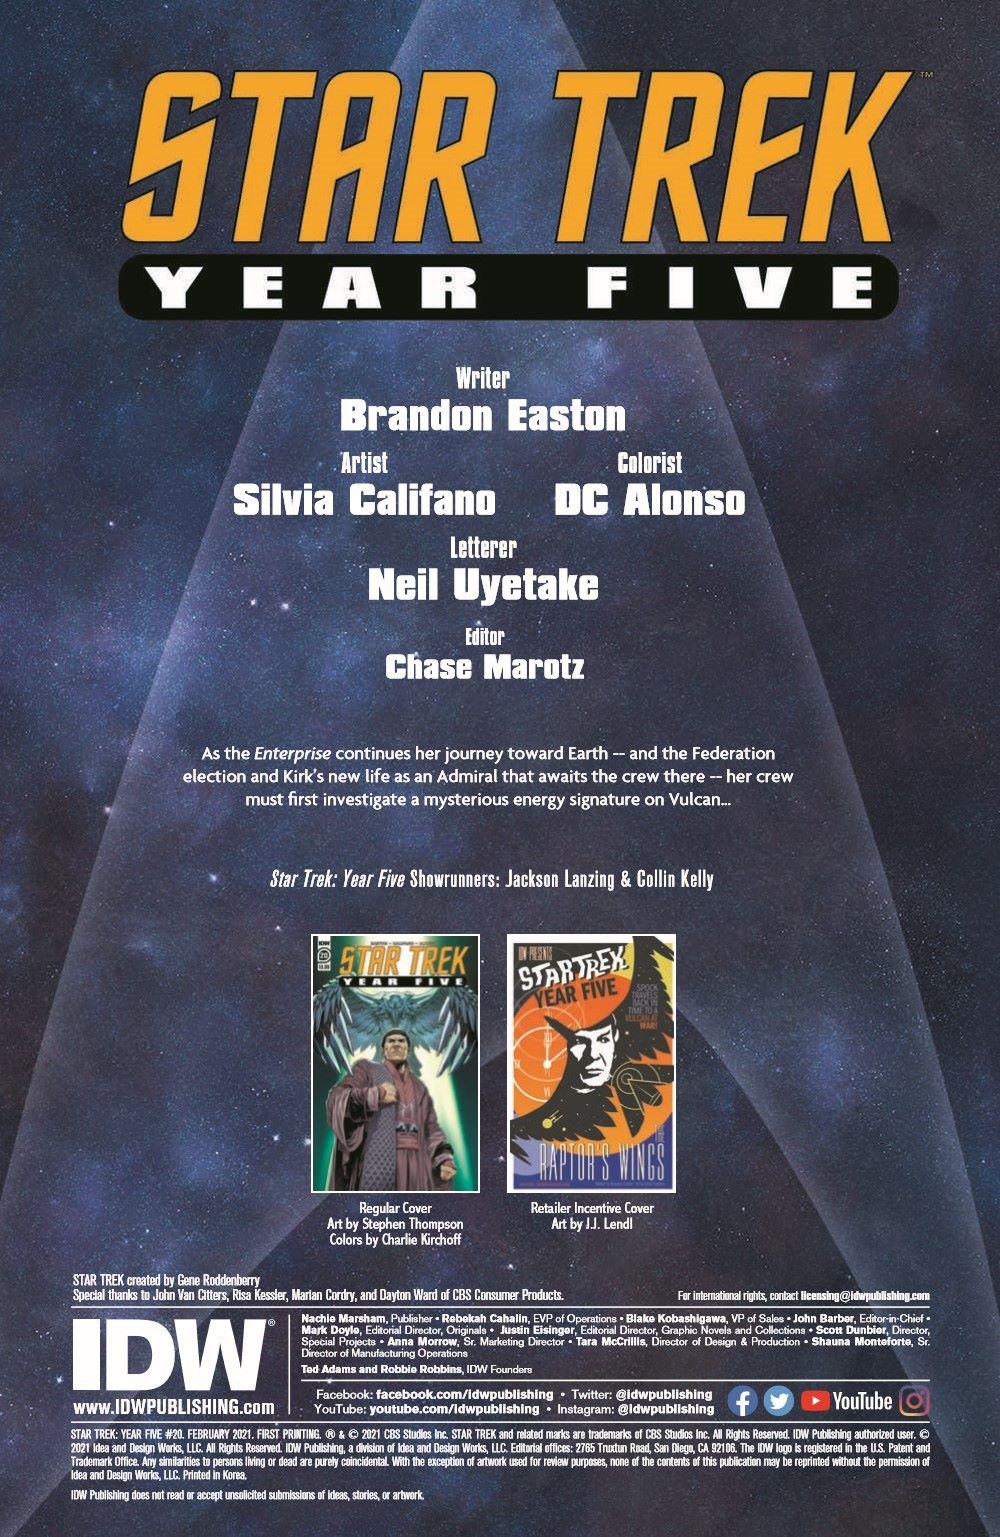 ST_YearFive20-pr-2 ComicList Previews: STAR TREK YEAR FIVE #20